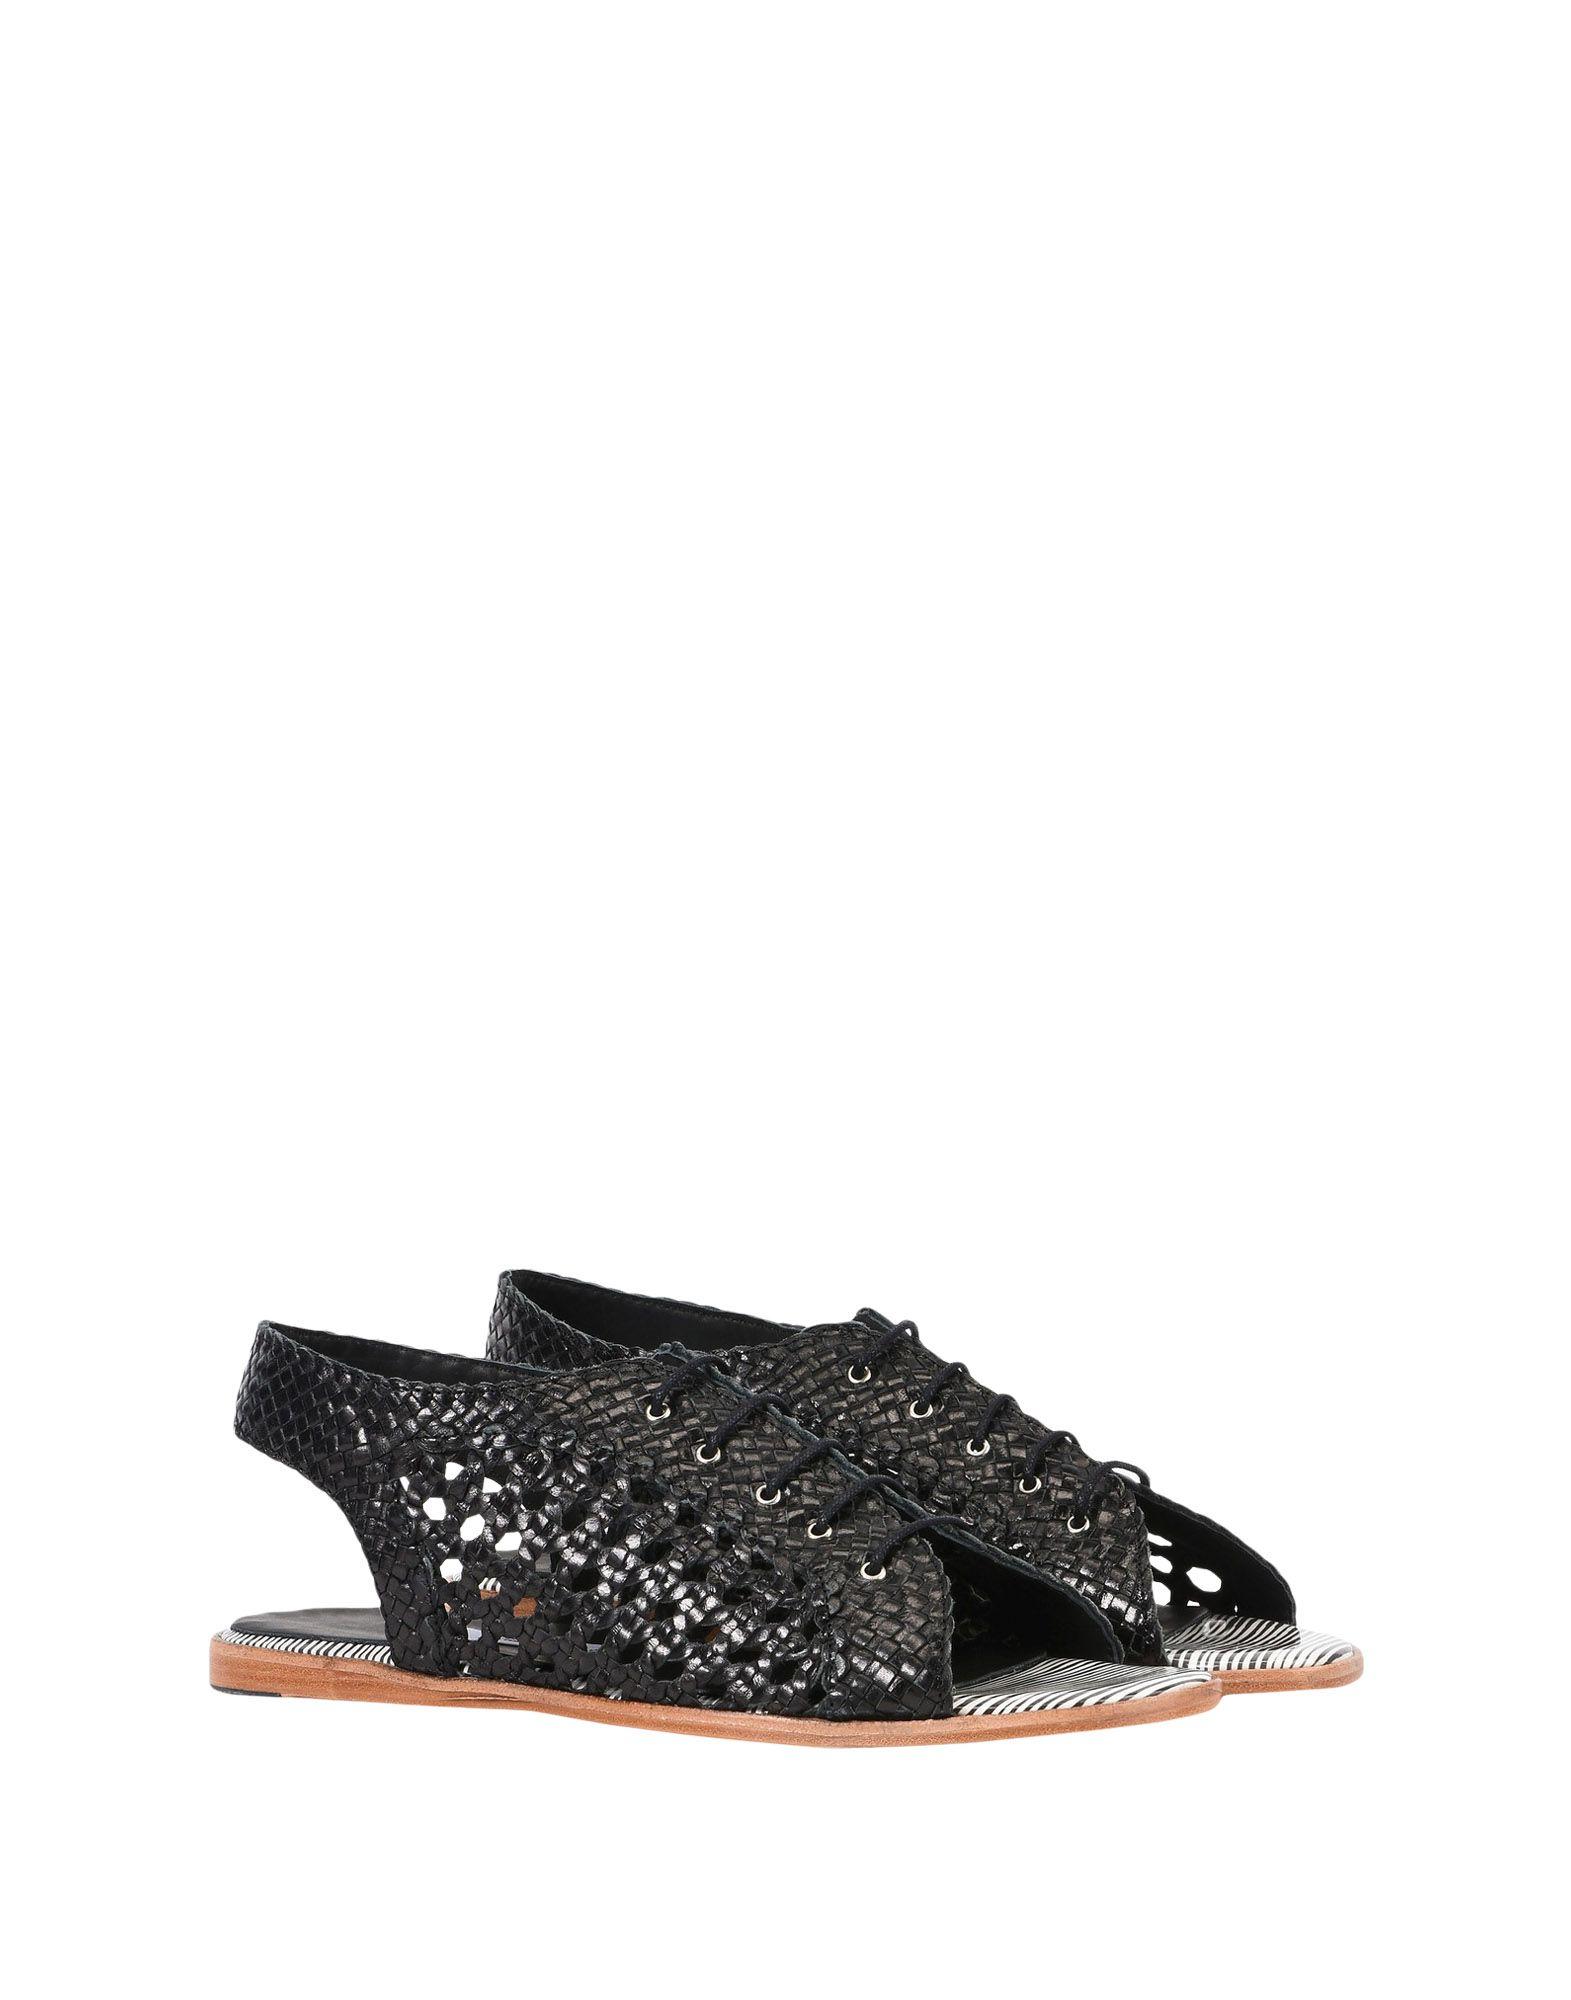 Miista Sandalen Damen Heiße  11261819RT Heiße Damen Schuhe 7546d7